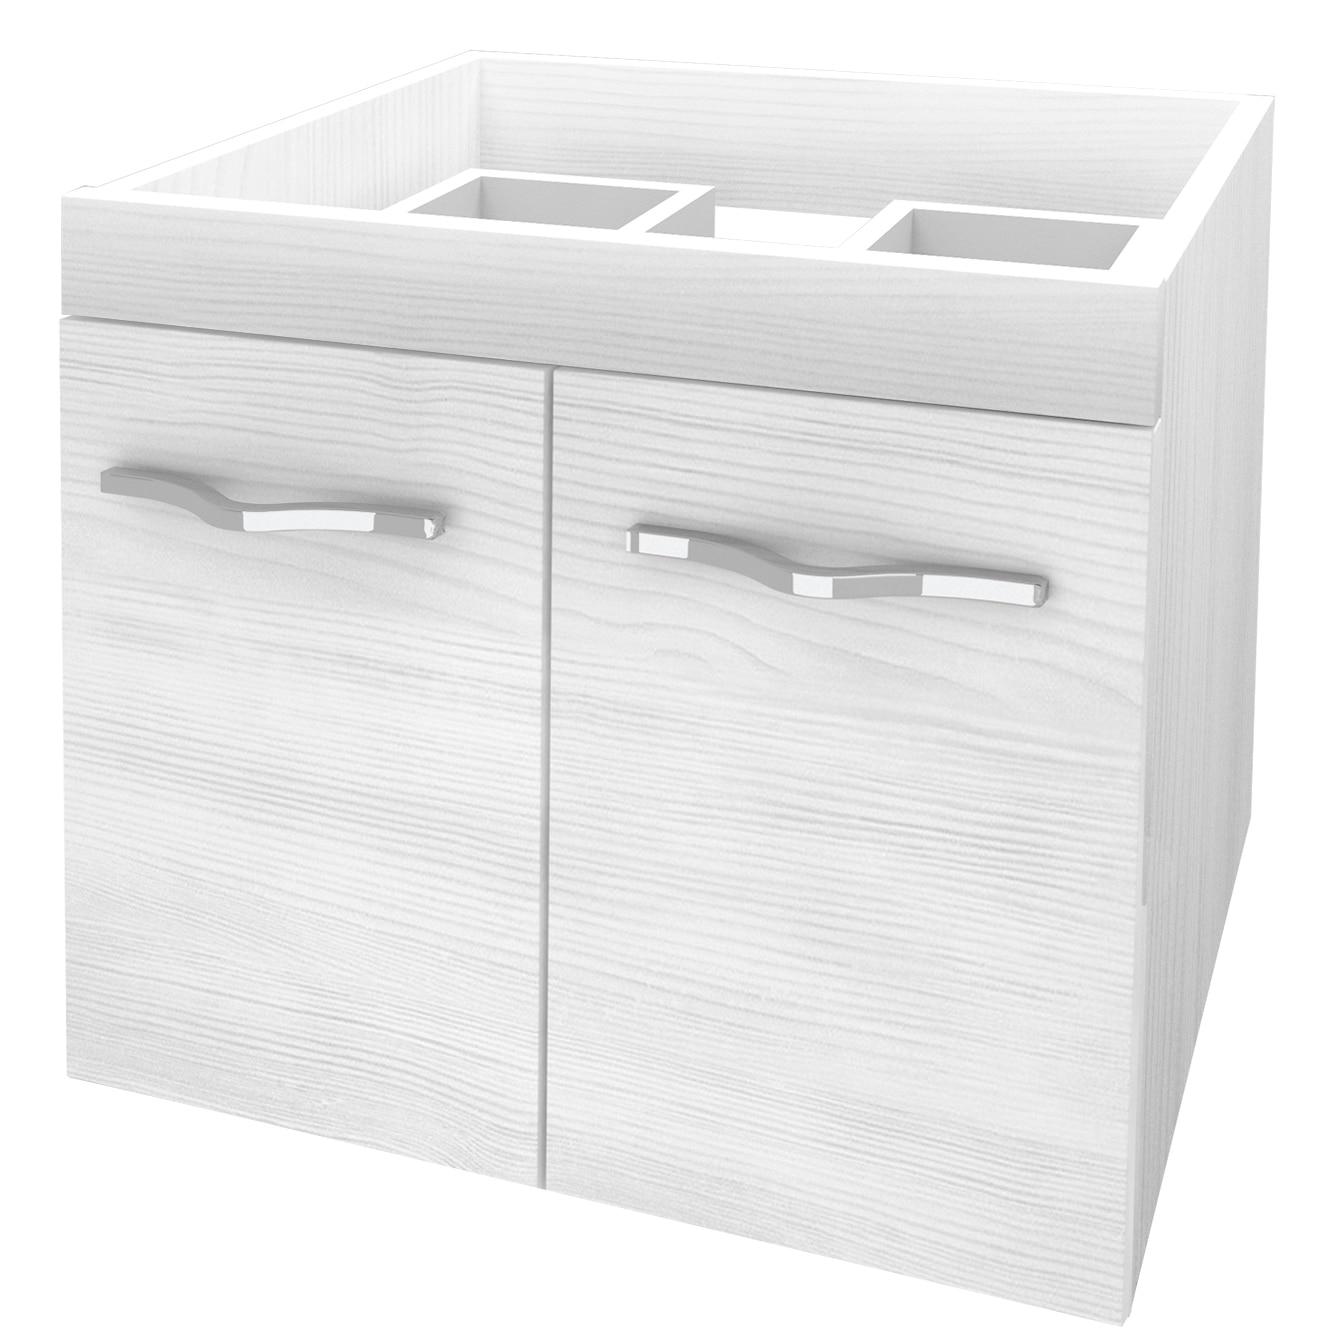 Fotografie Baza mobilier suspendat, cu doua usi cu inchidere amortizata, Kring Corallo Bianco, 60x51x46cm